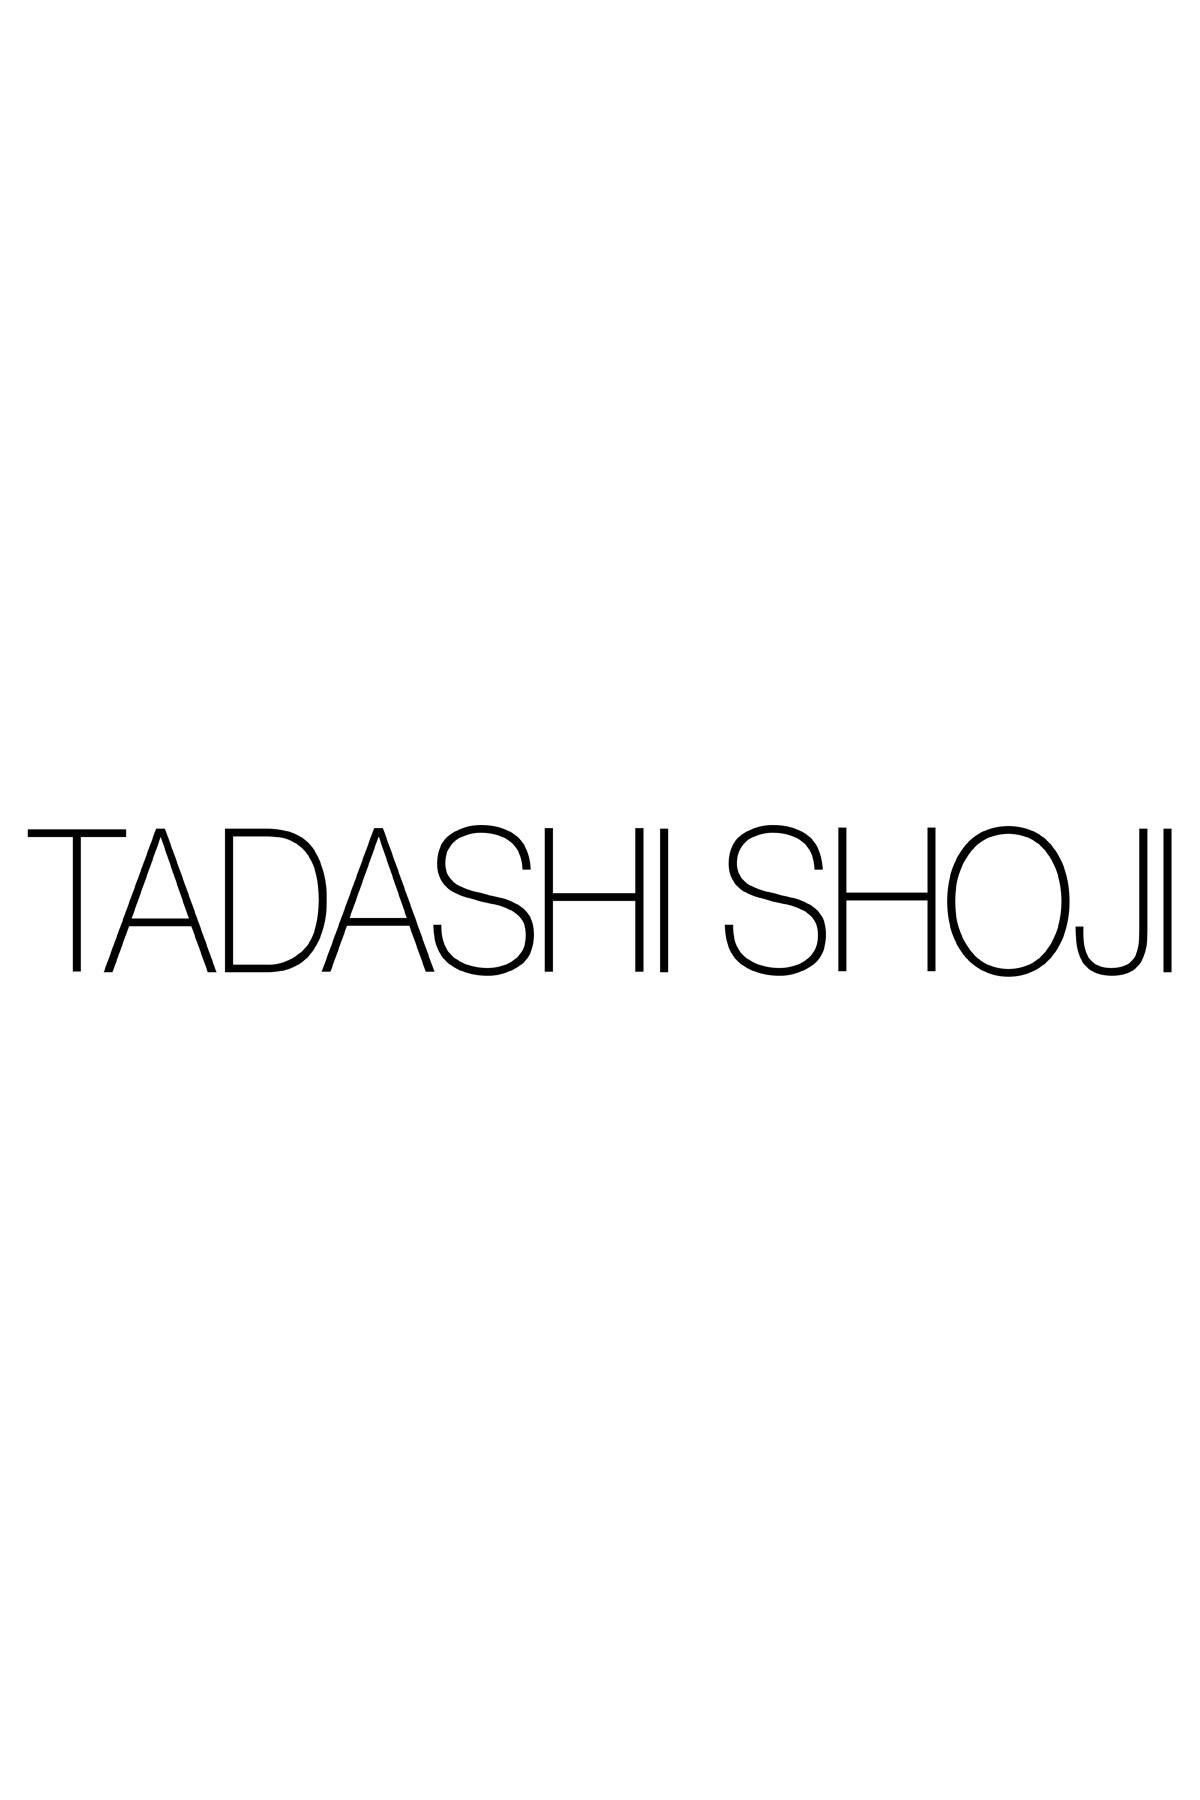 Tadashi Shoji - Parma Draped Sequin Gown - PETITE